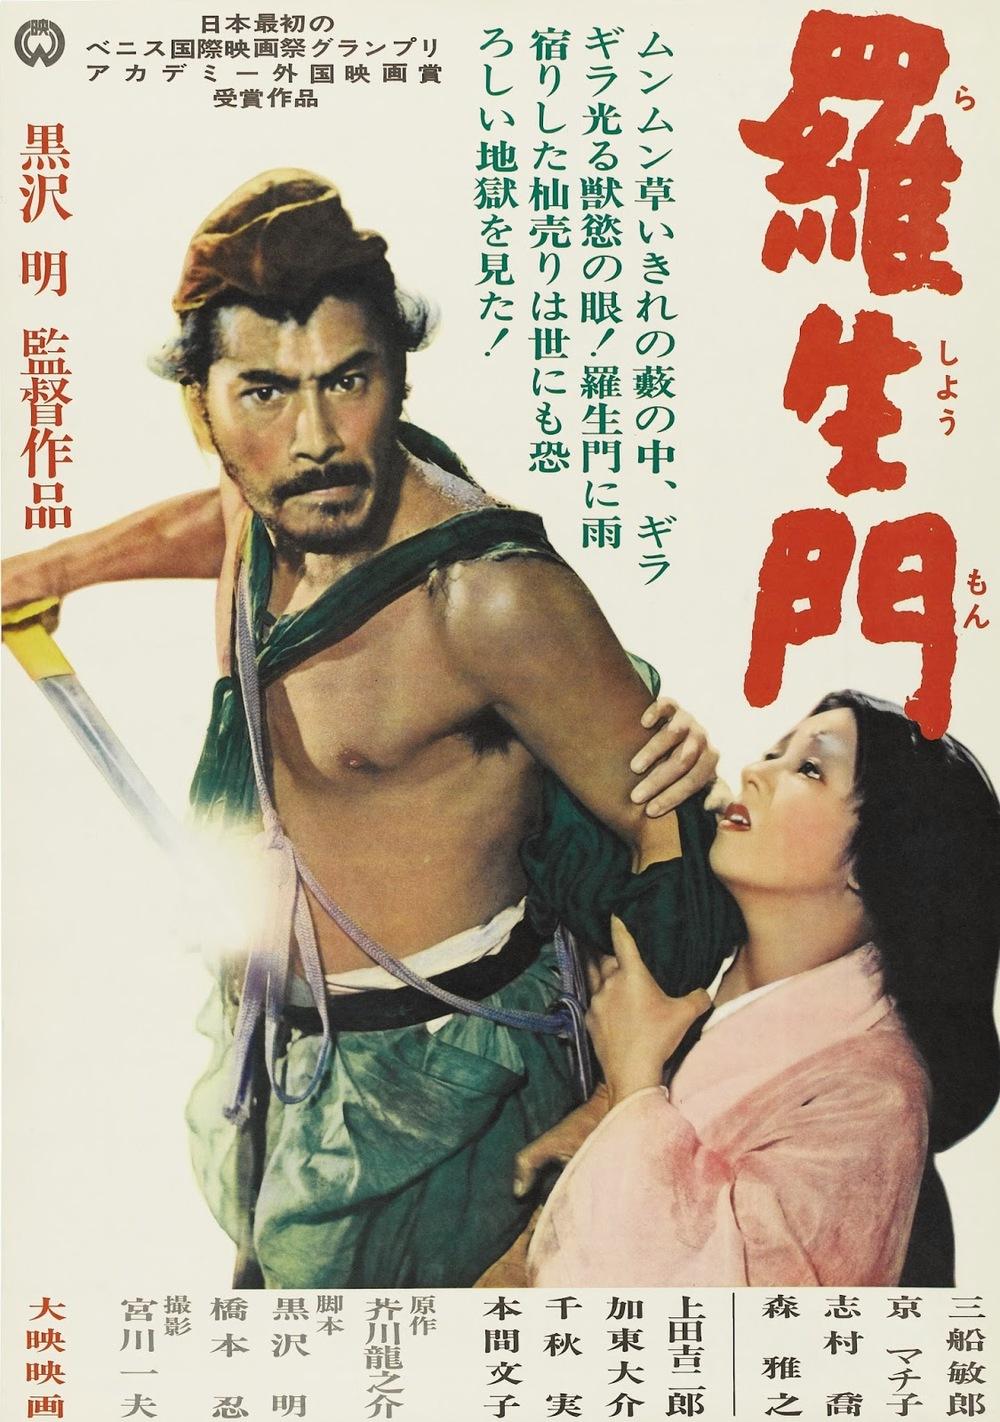 Akira Kurosawa's Rashomon (1950)